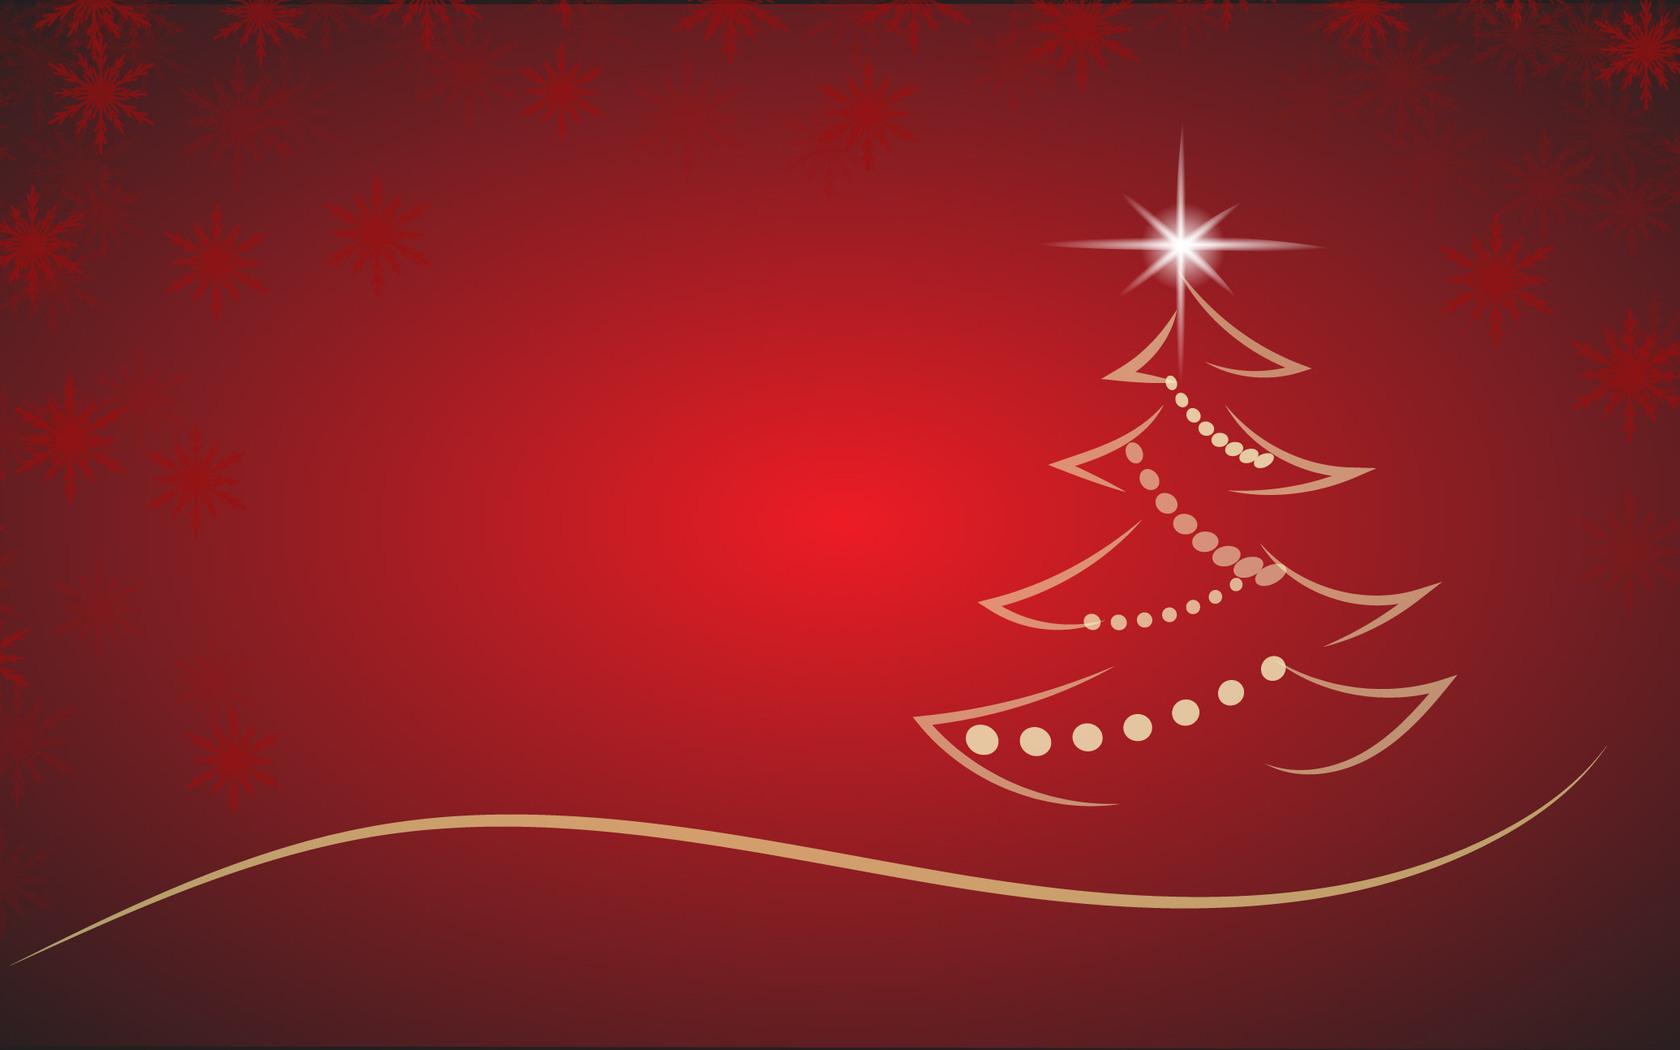 christmas-tree-background-uk.jpg